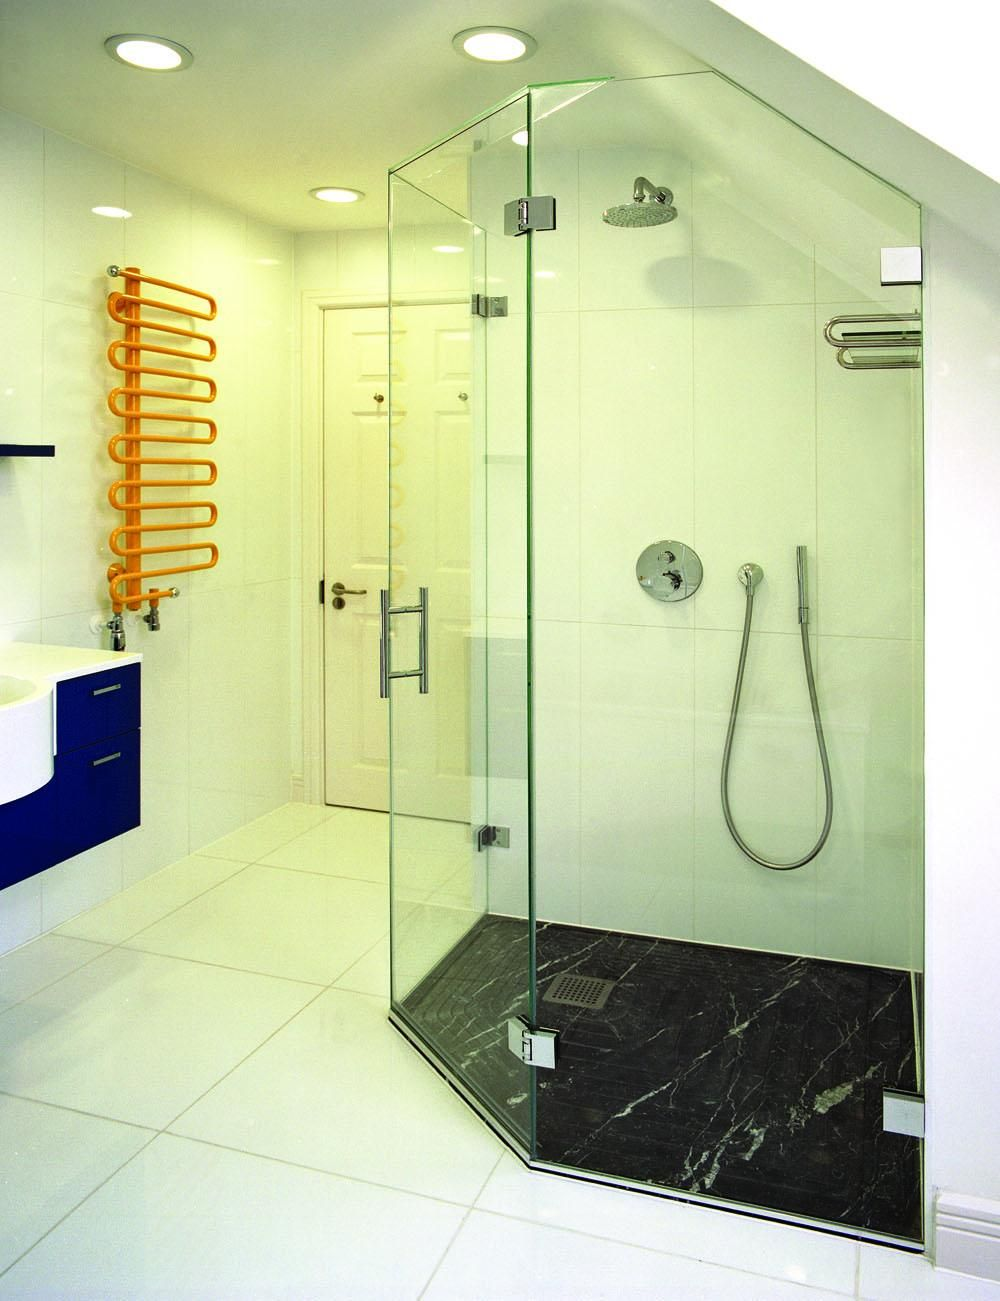 Simply Beautiful Bathrooms Uk shower enclosures | glasstrends - frameless shower doors, cubicles